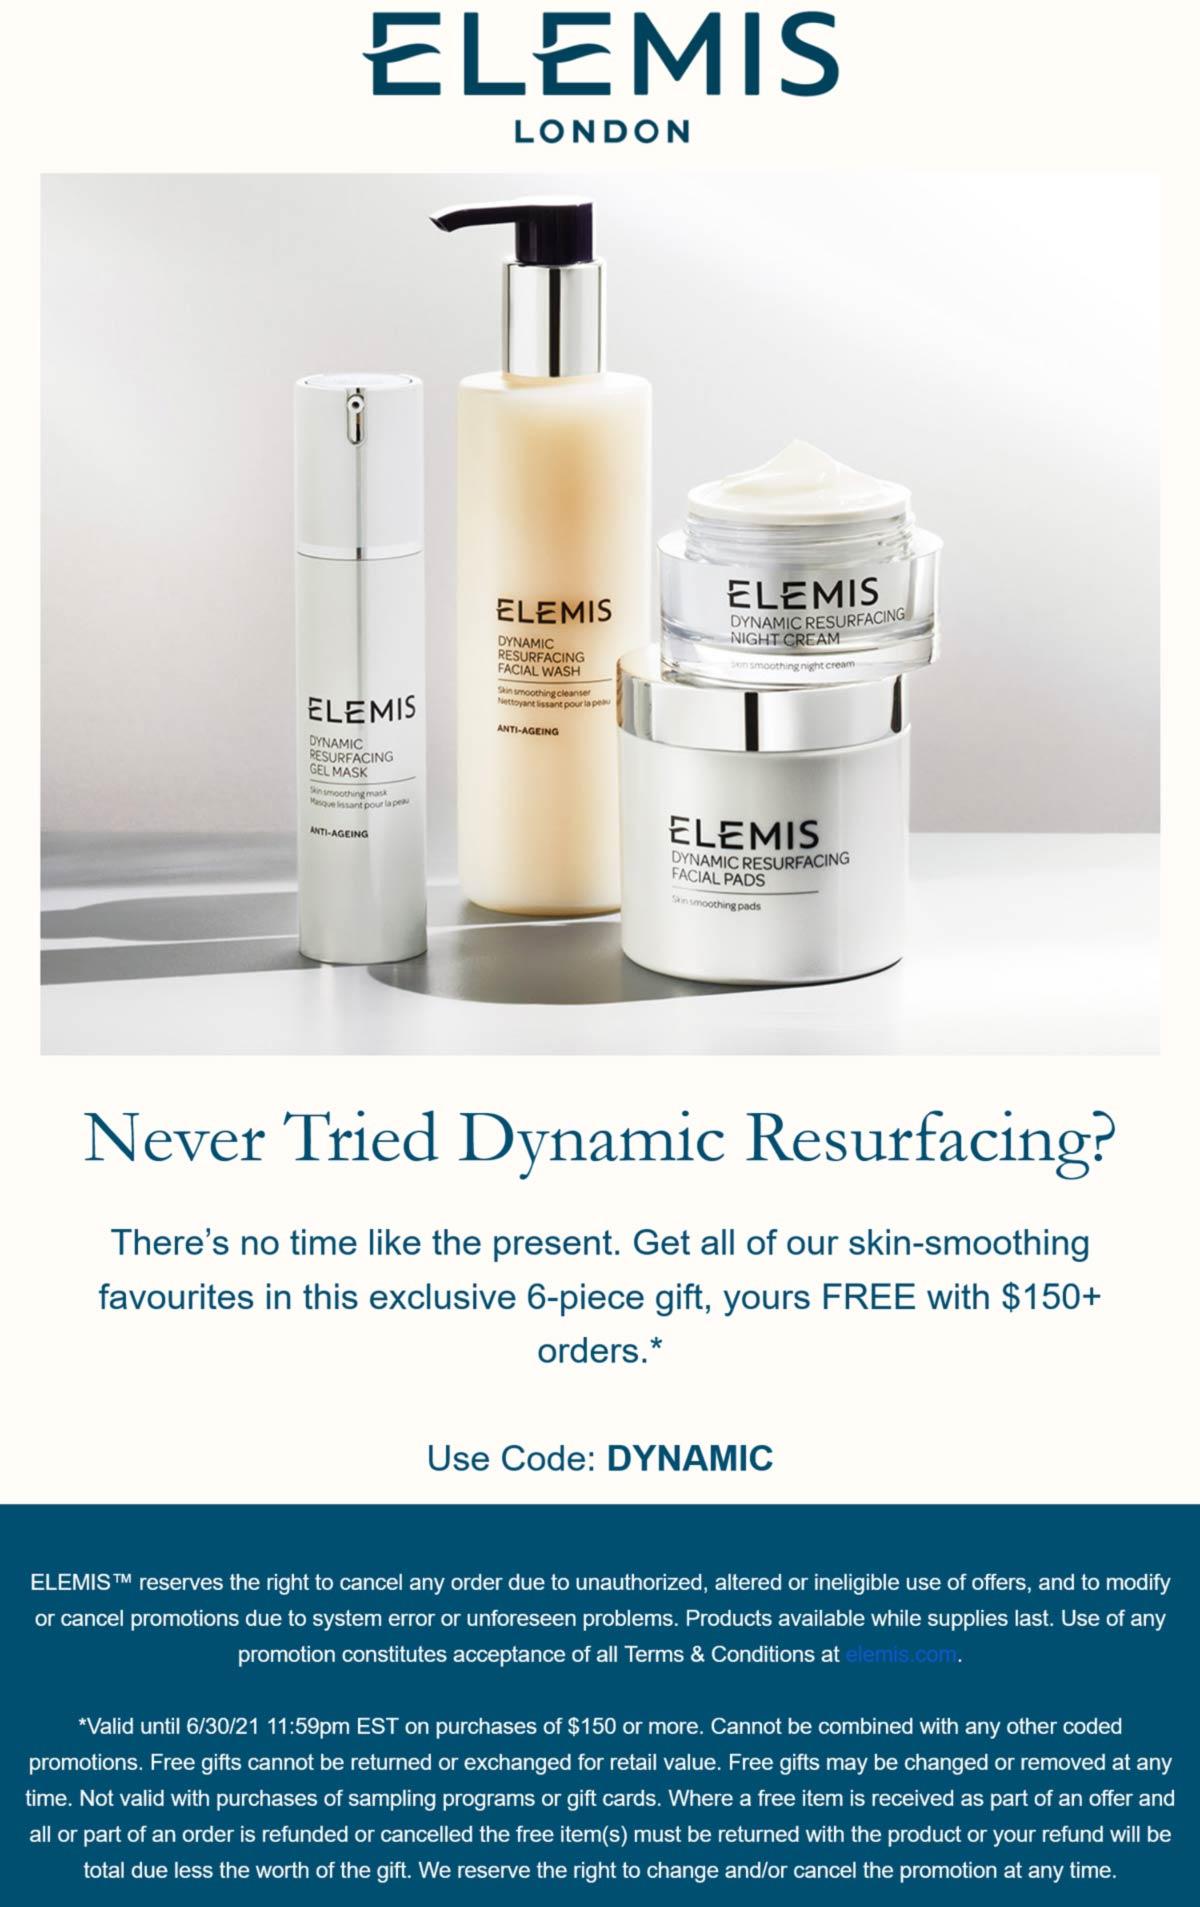 Elemis stores Coupon  Free 6pc set with $150 spent at Elemis cosmetics via promo code DYNAMIC #elemis